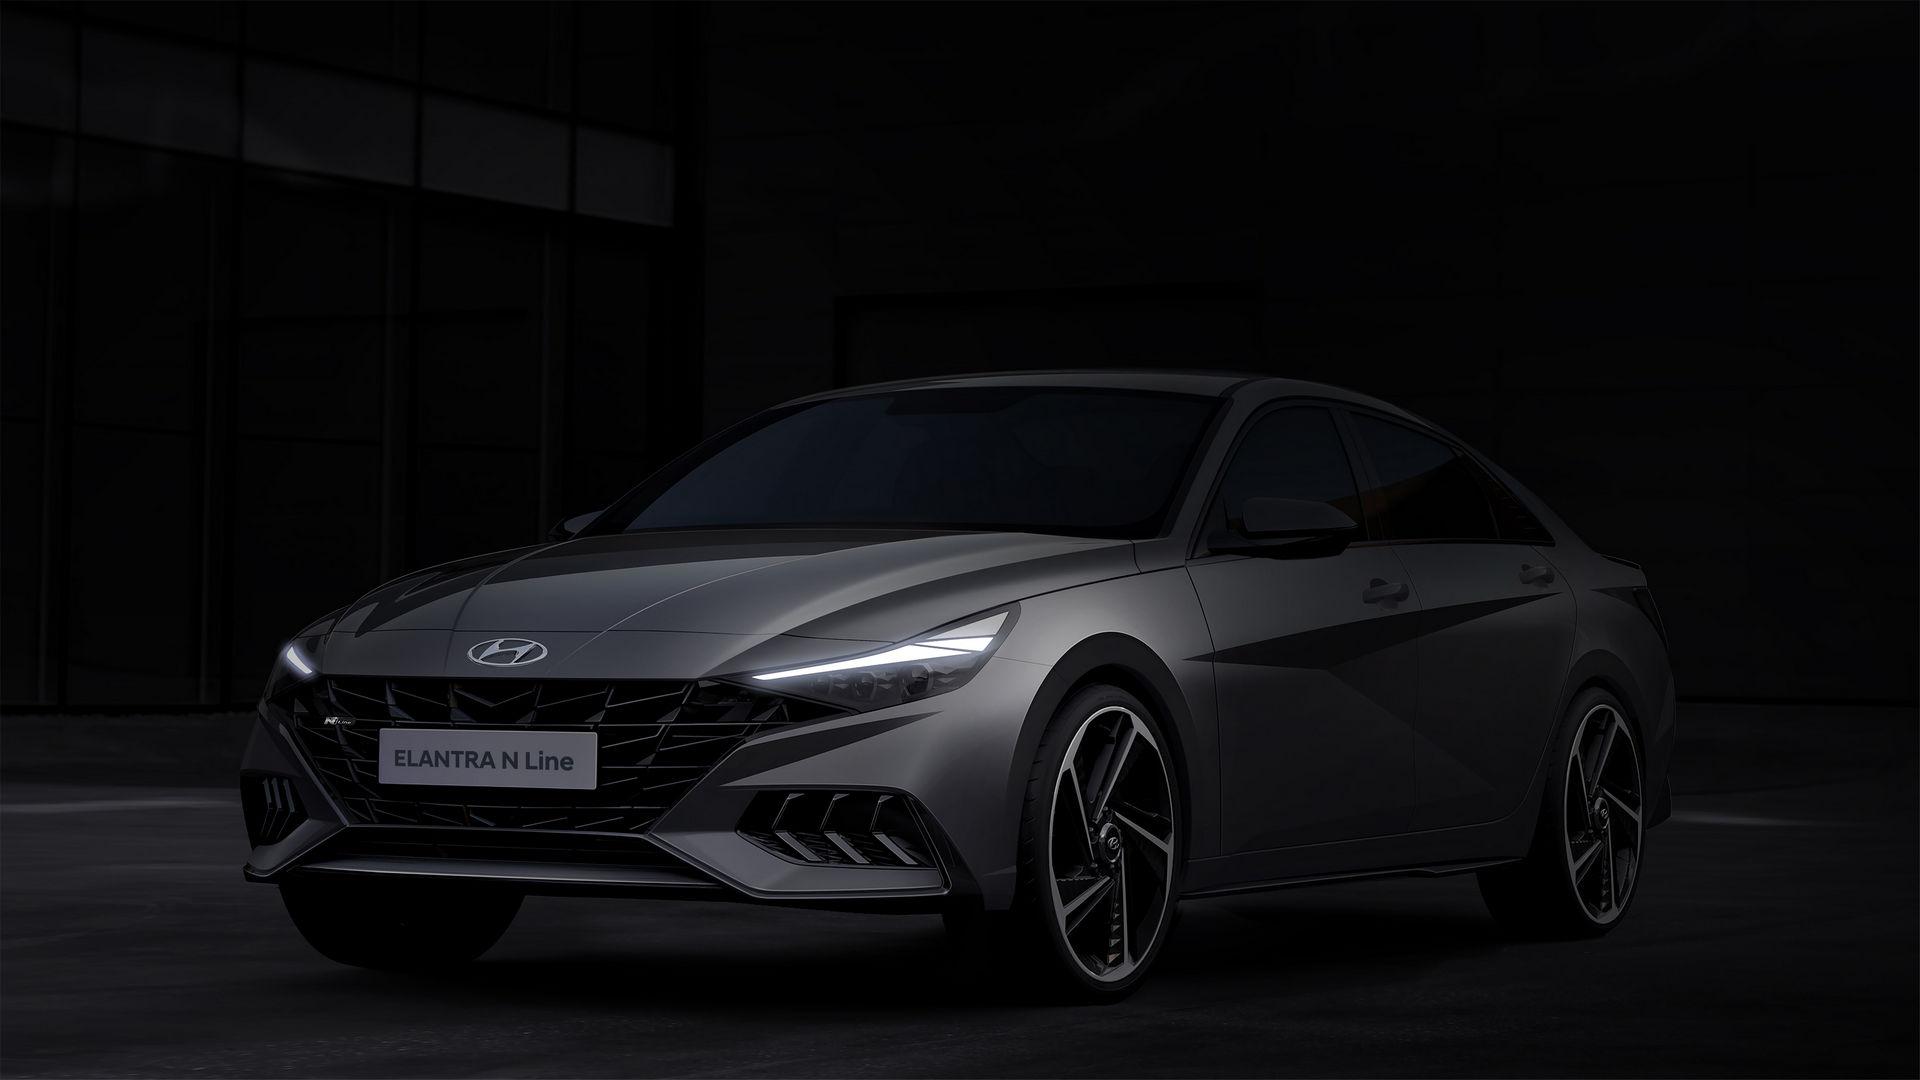 Hyundai-Elantra-N-Line-2021-1